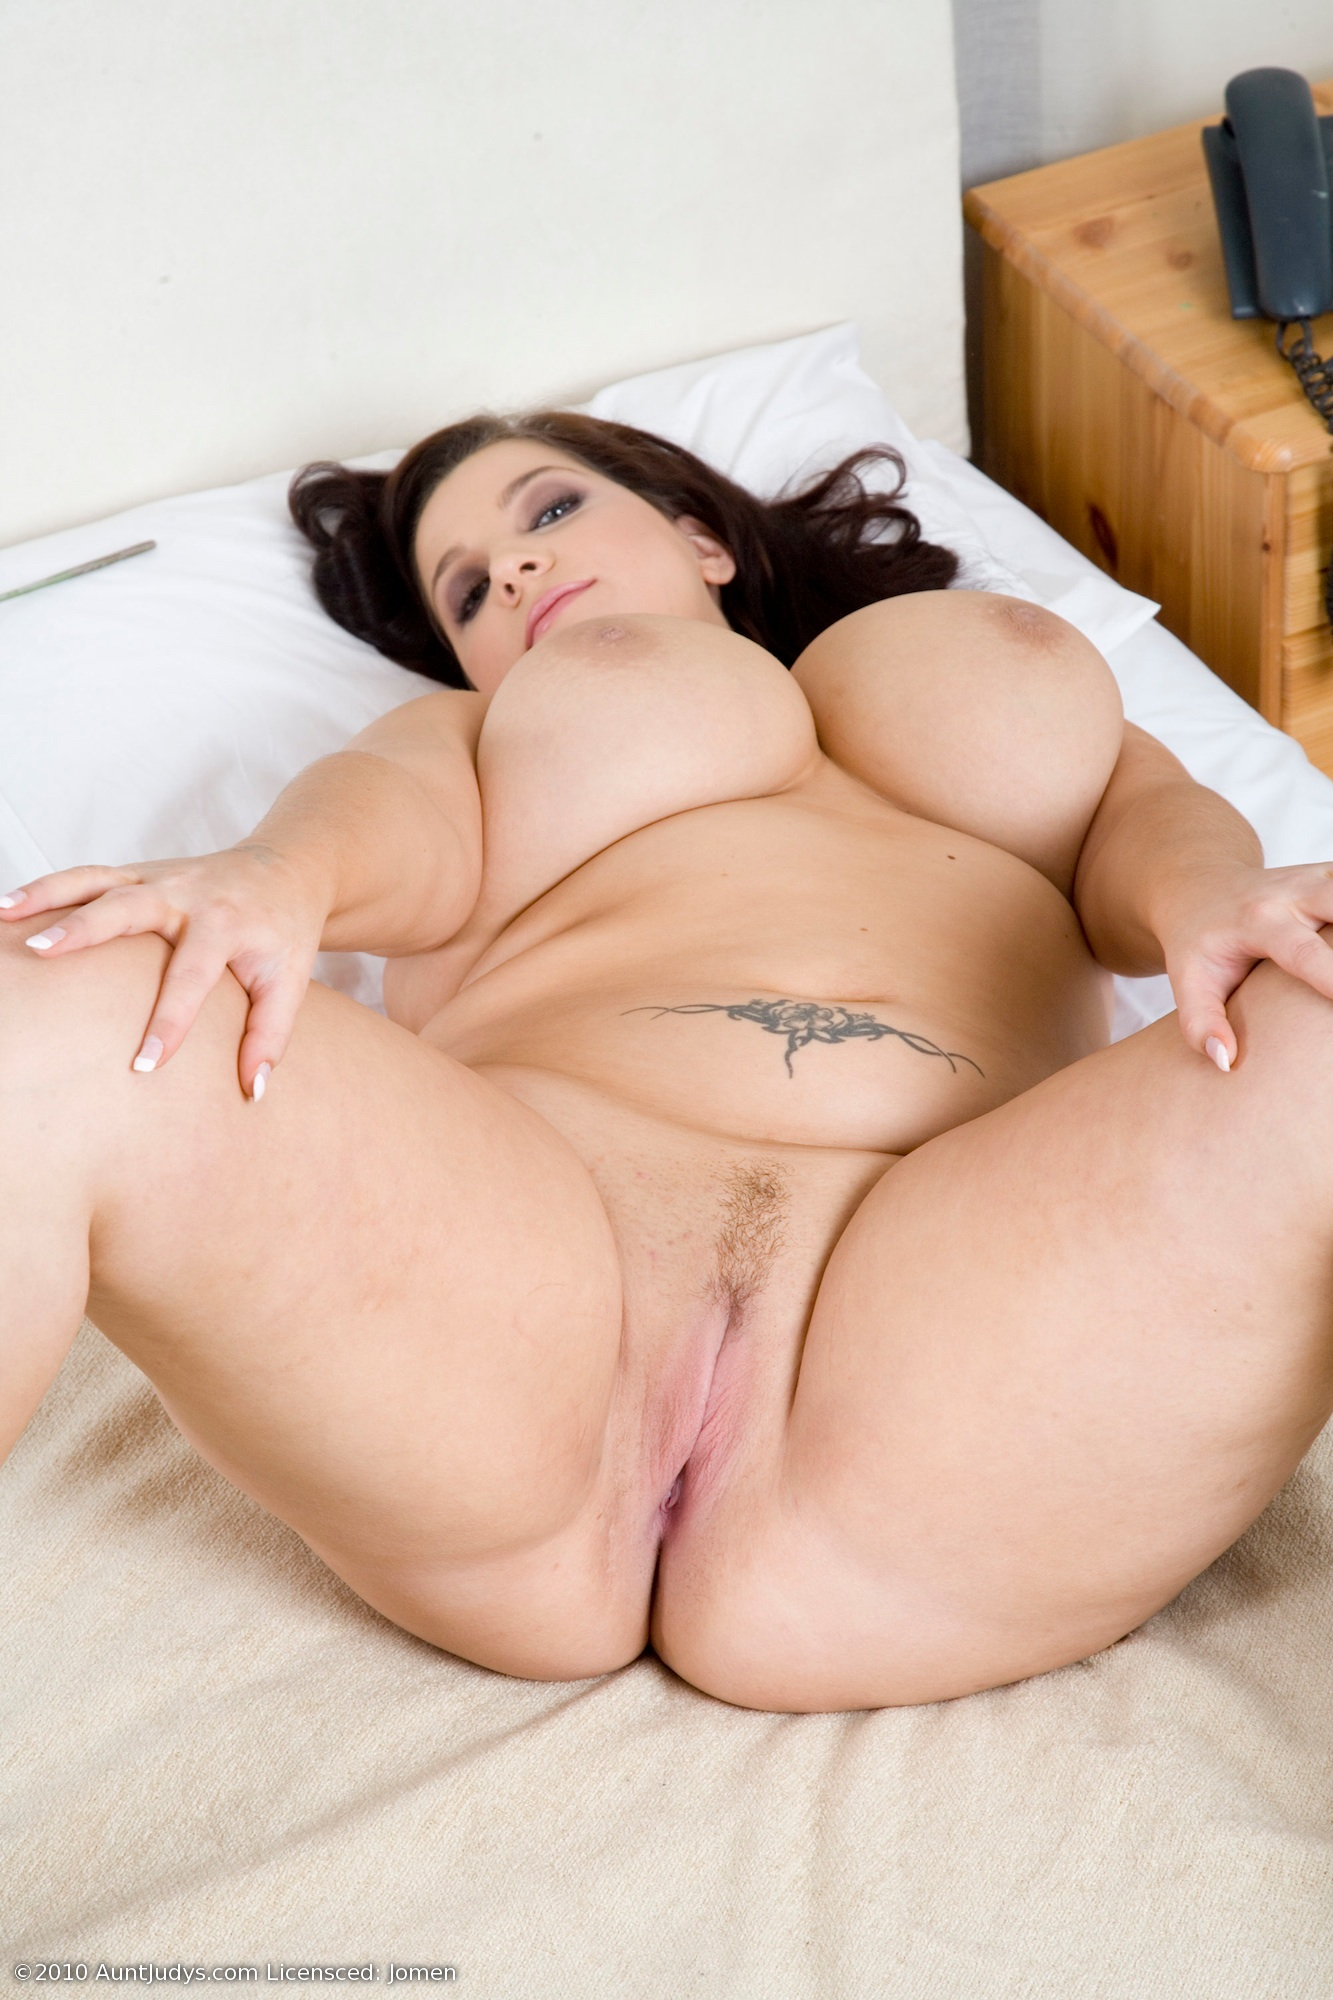 Толстушки порно для андроида 4 фотография